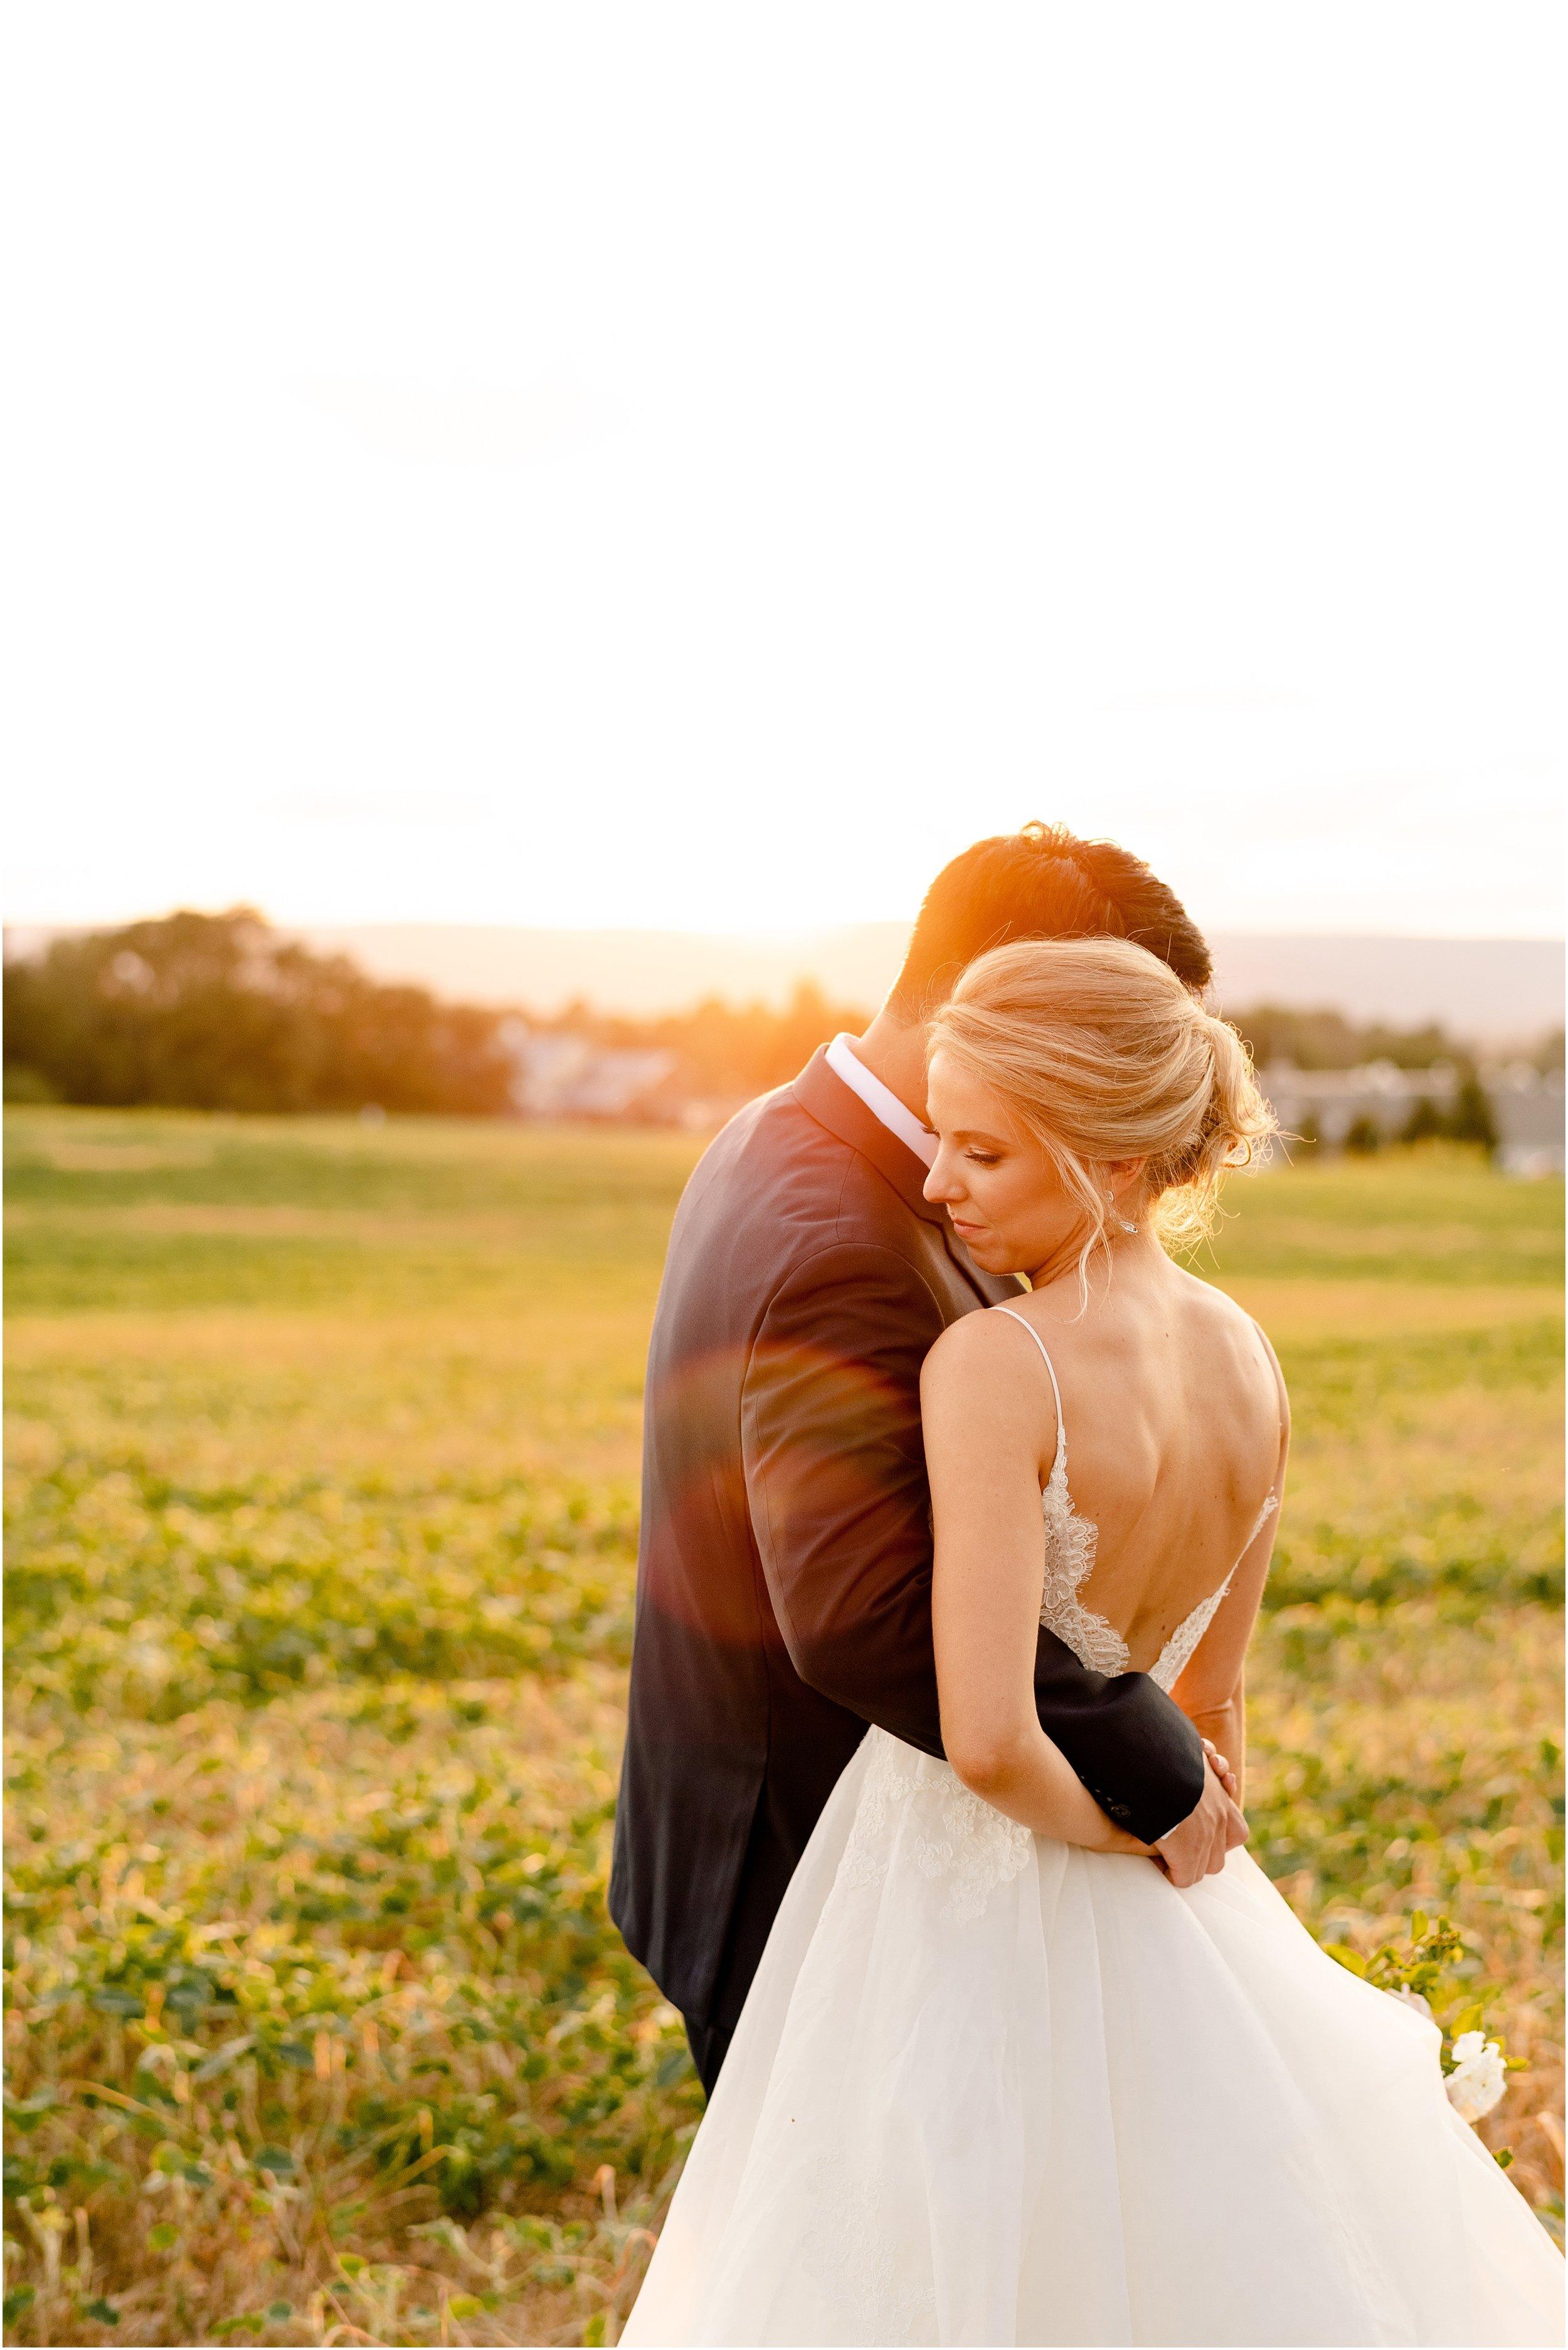 hannah leigh photography Walkers Overlook Wedding Walkersville MD_3561.jpg